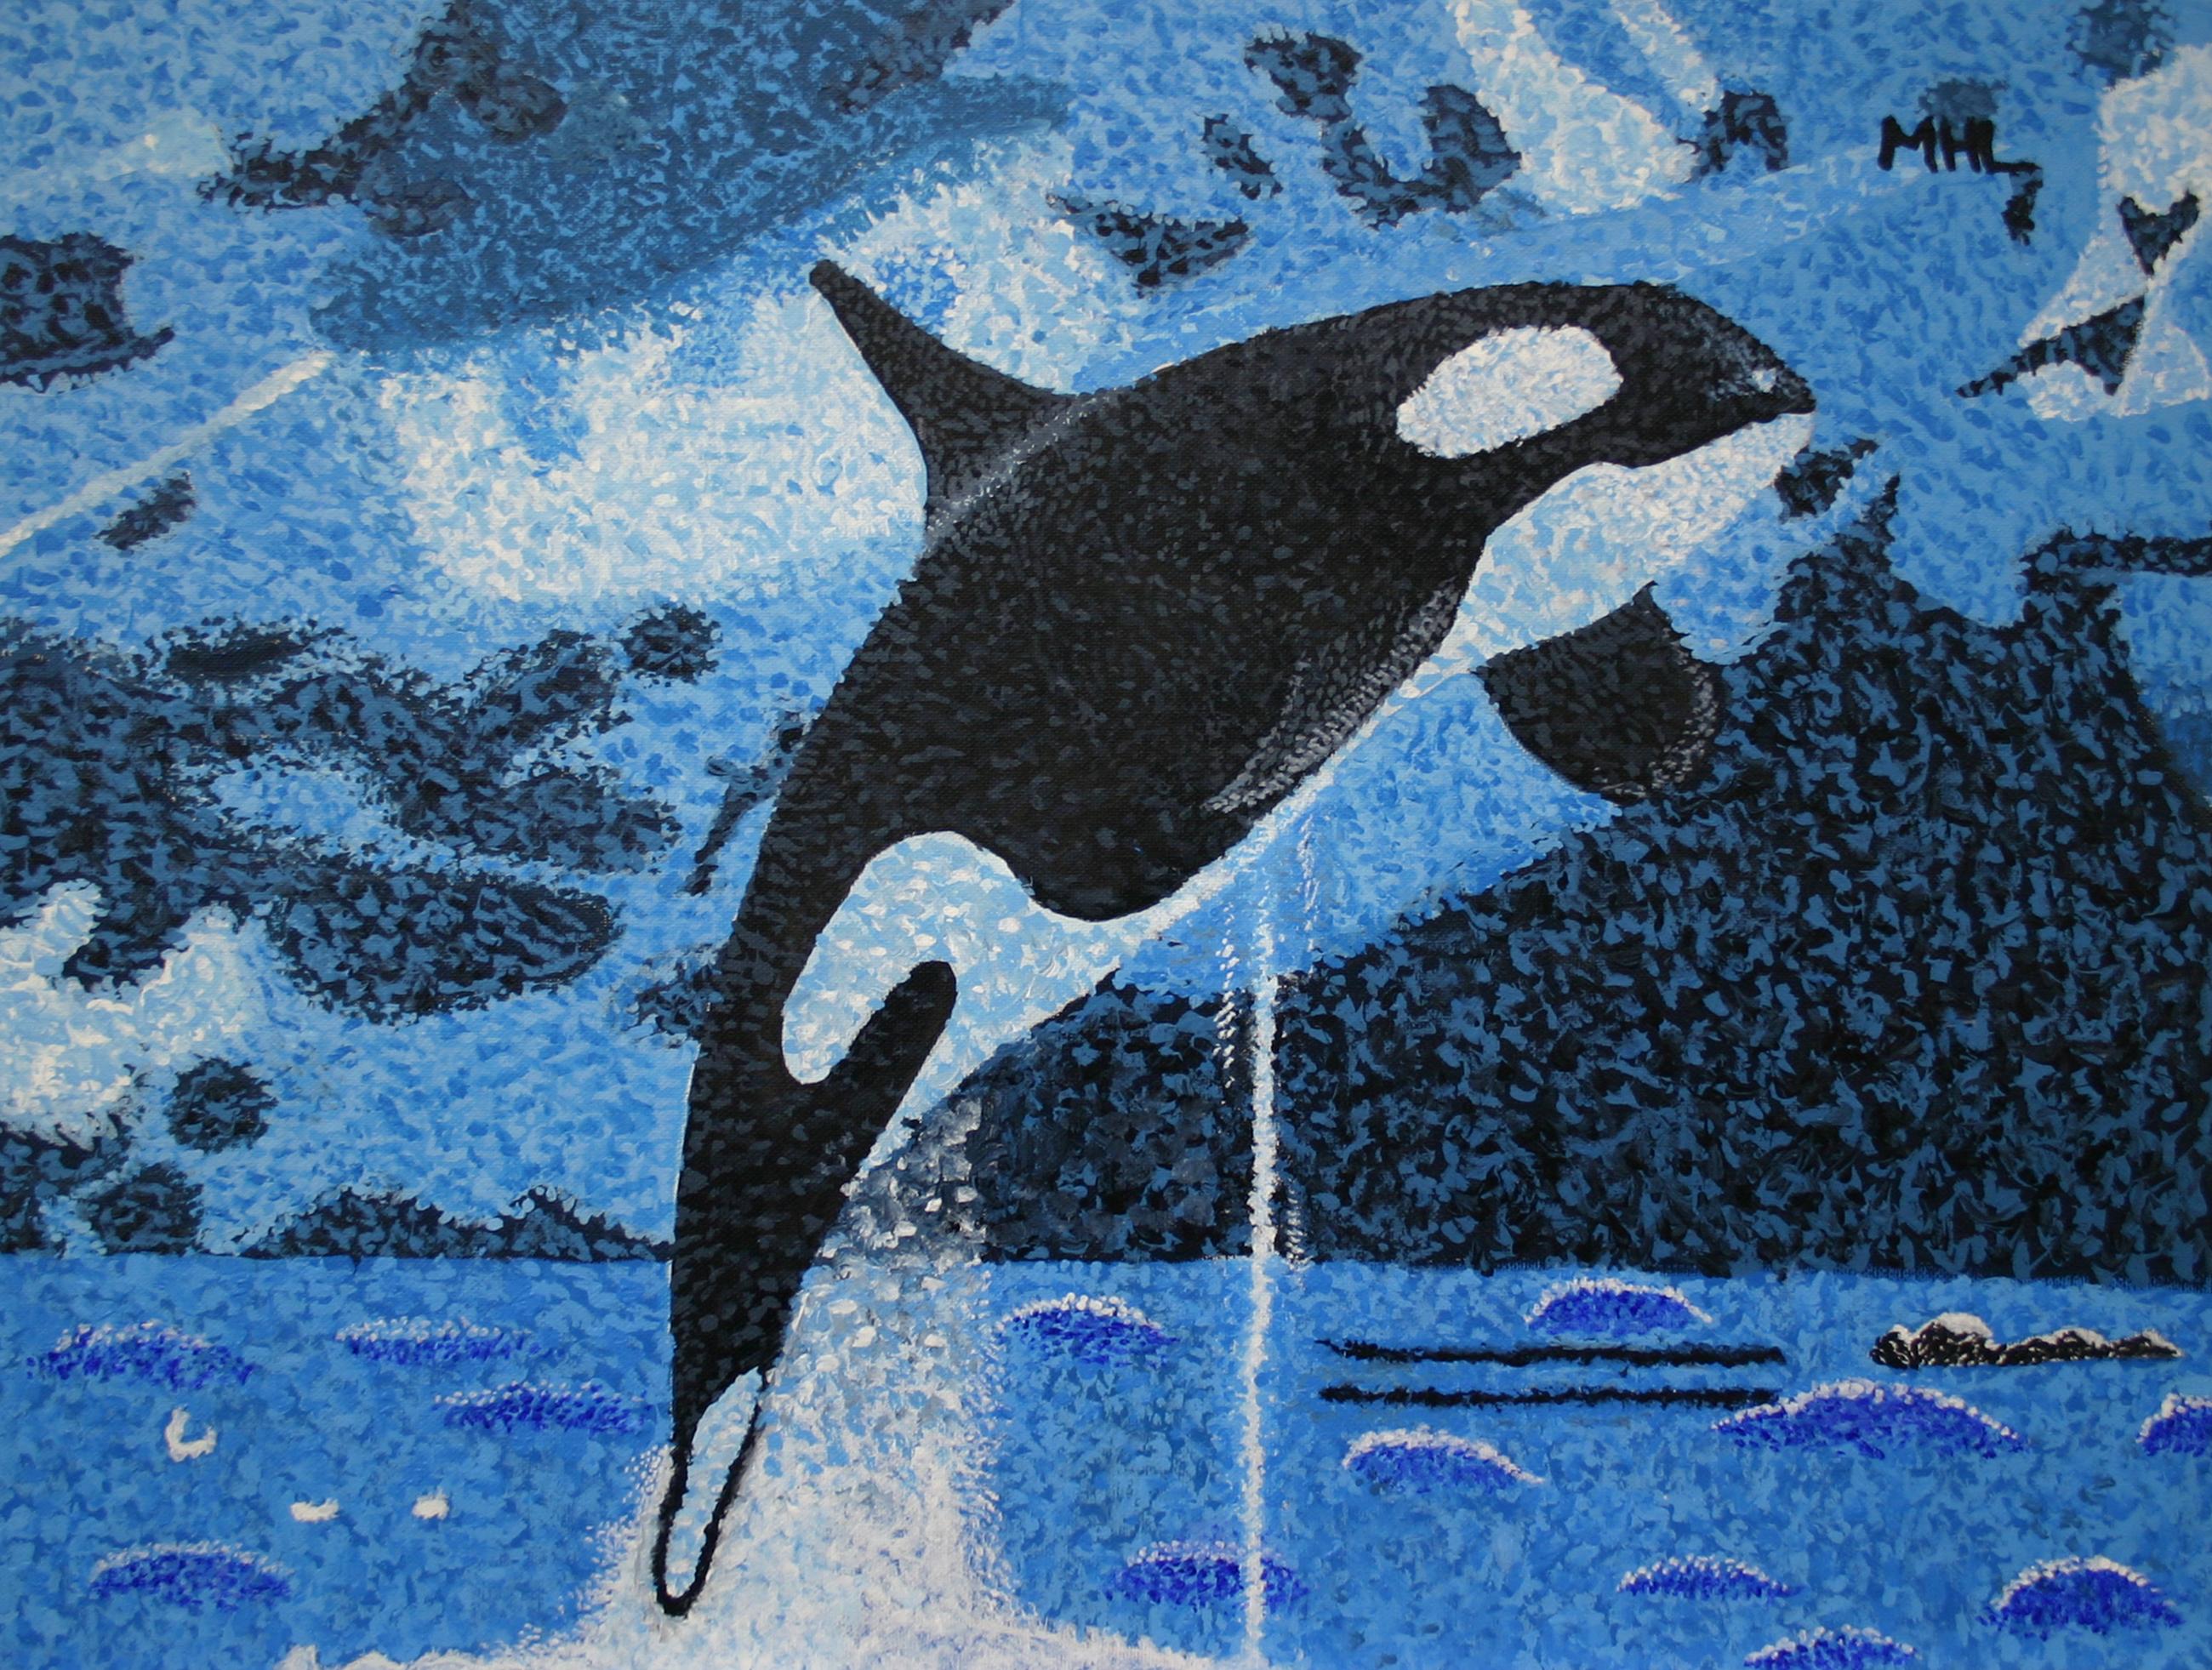 Morgan Lee - Breaching Orca